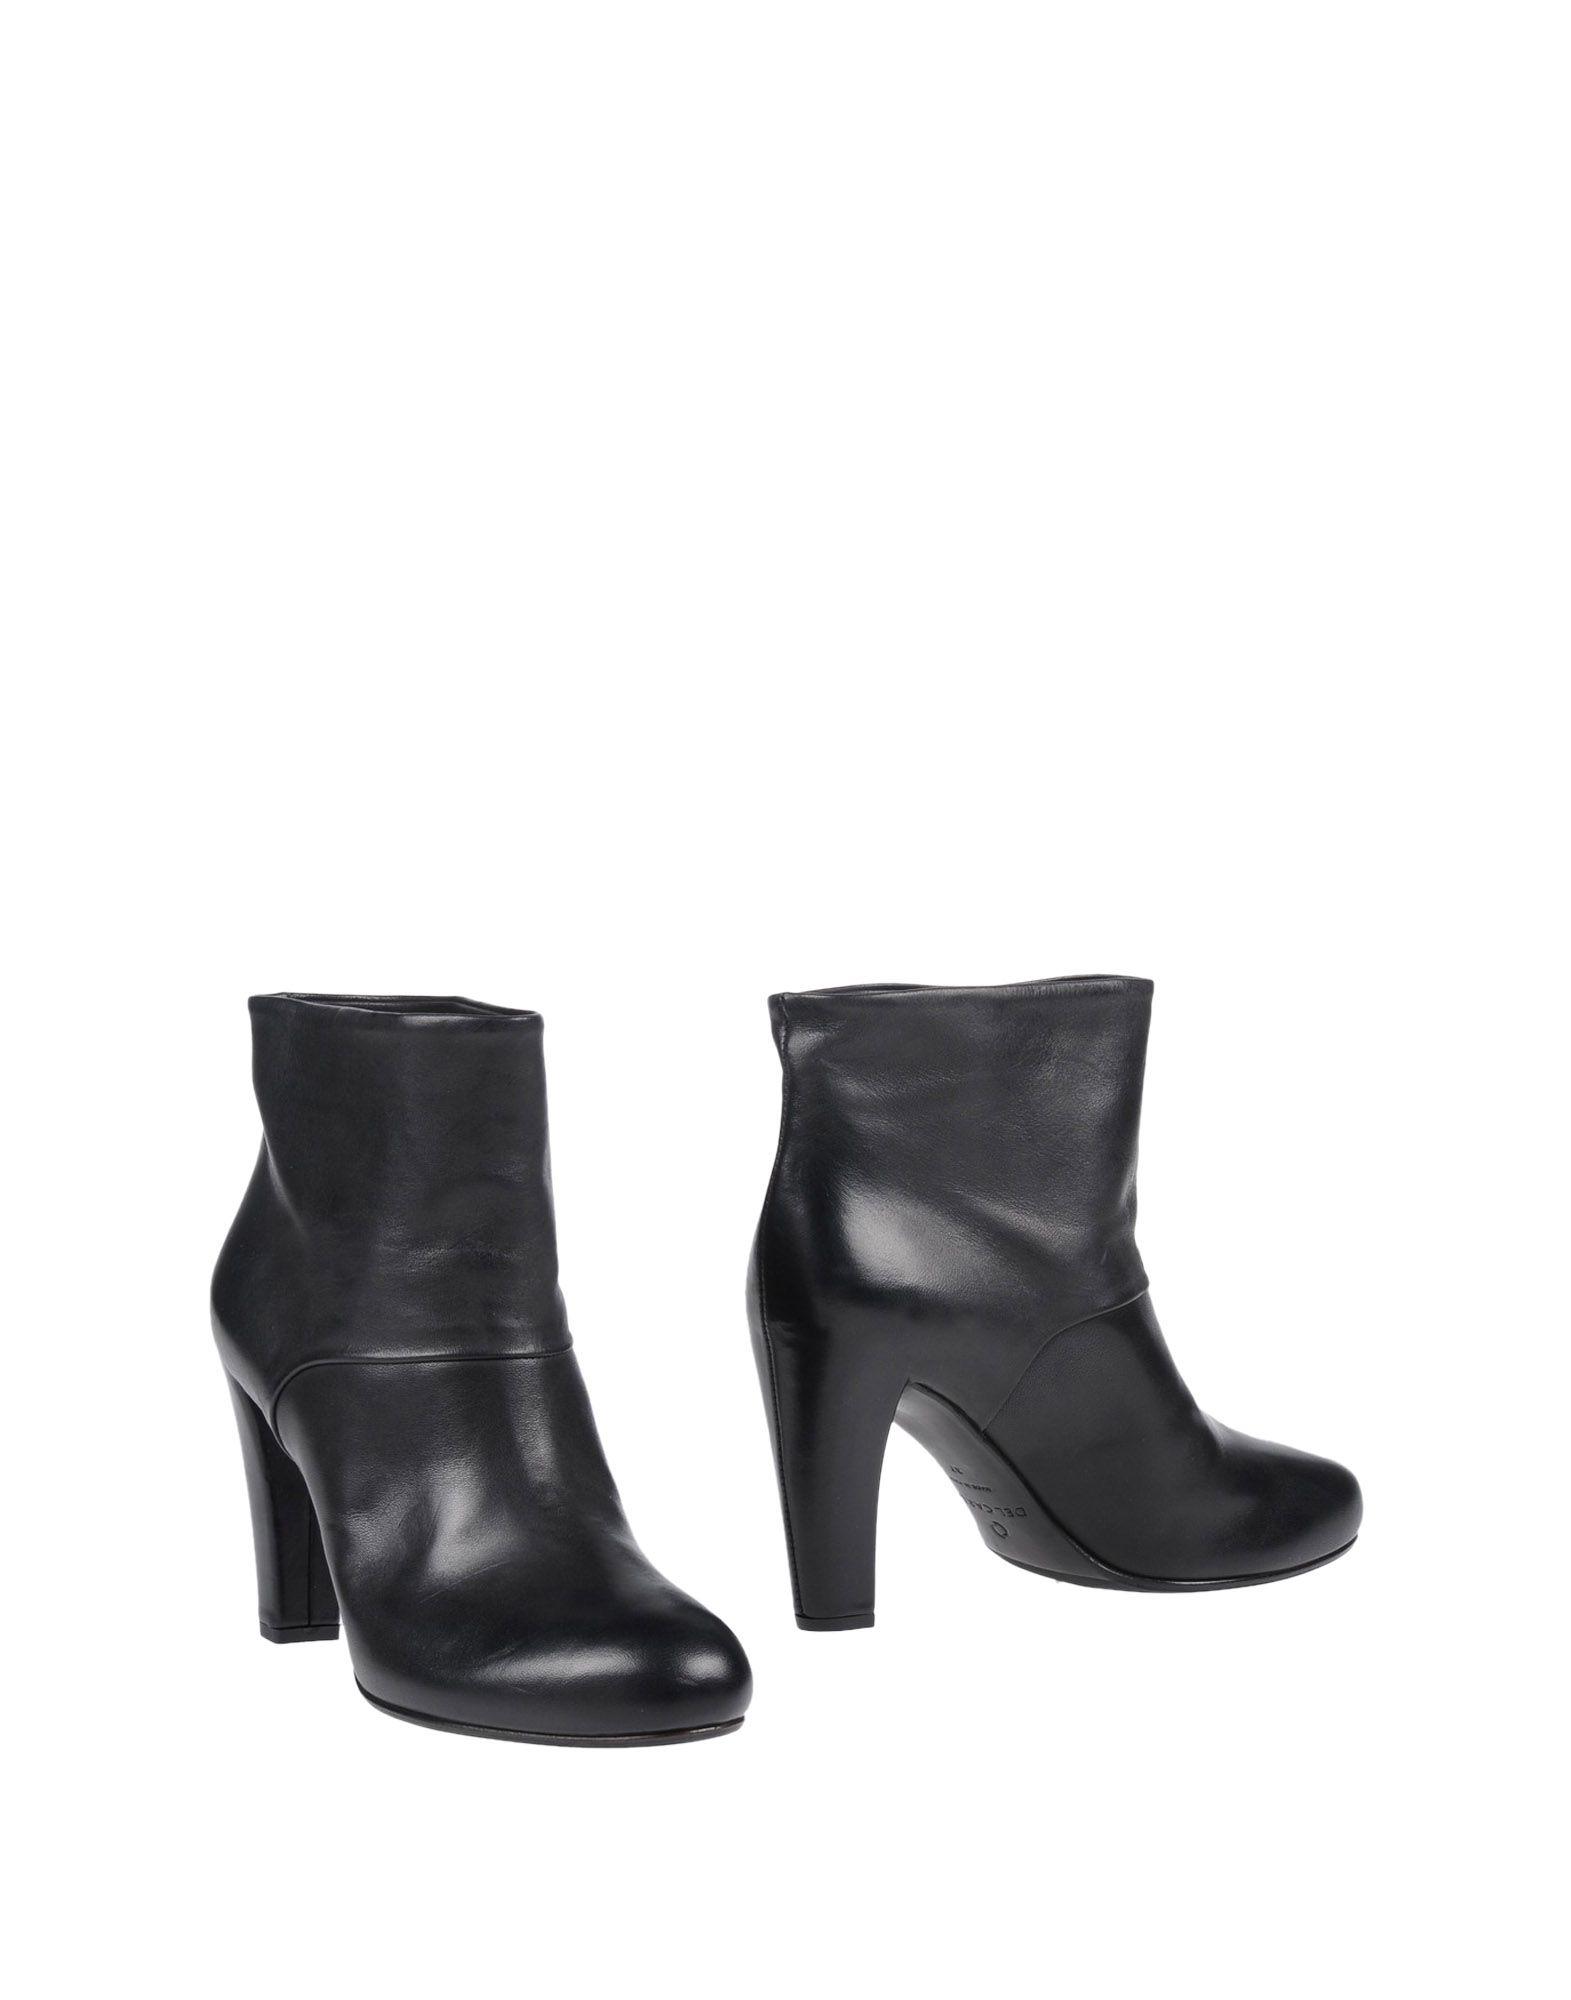 DEL CARLO Полусапоги и высокие ботинки magazzini del sale полусапоги и высокие ботинки